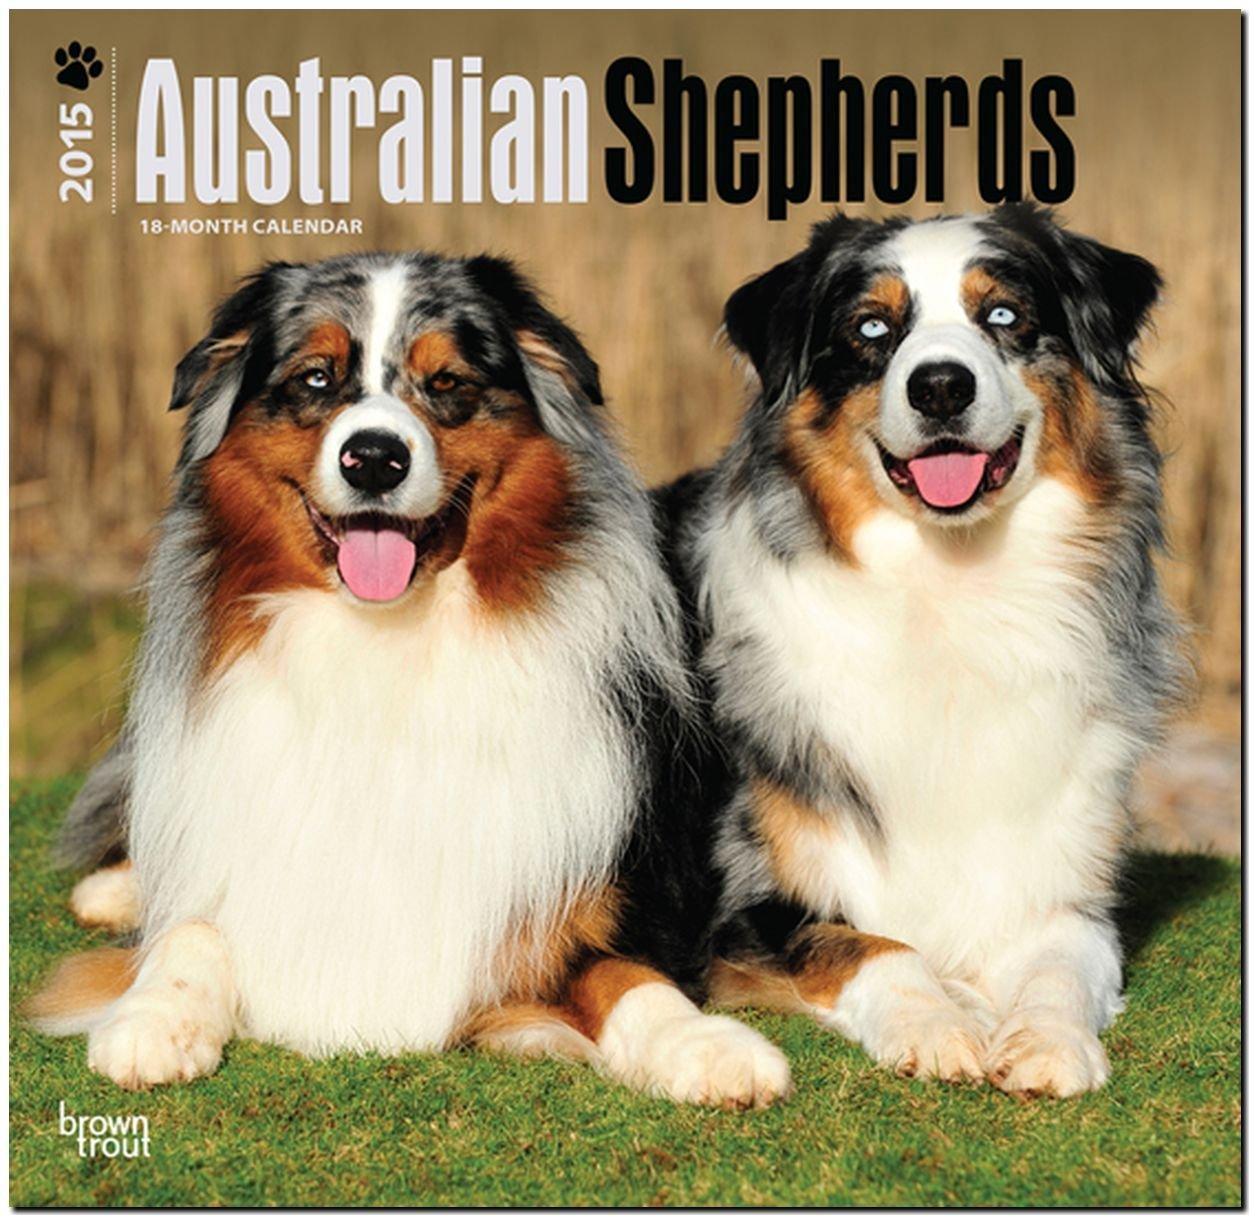 Australian Shepherds 2015 - Australische Schäferhunde